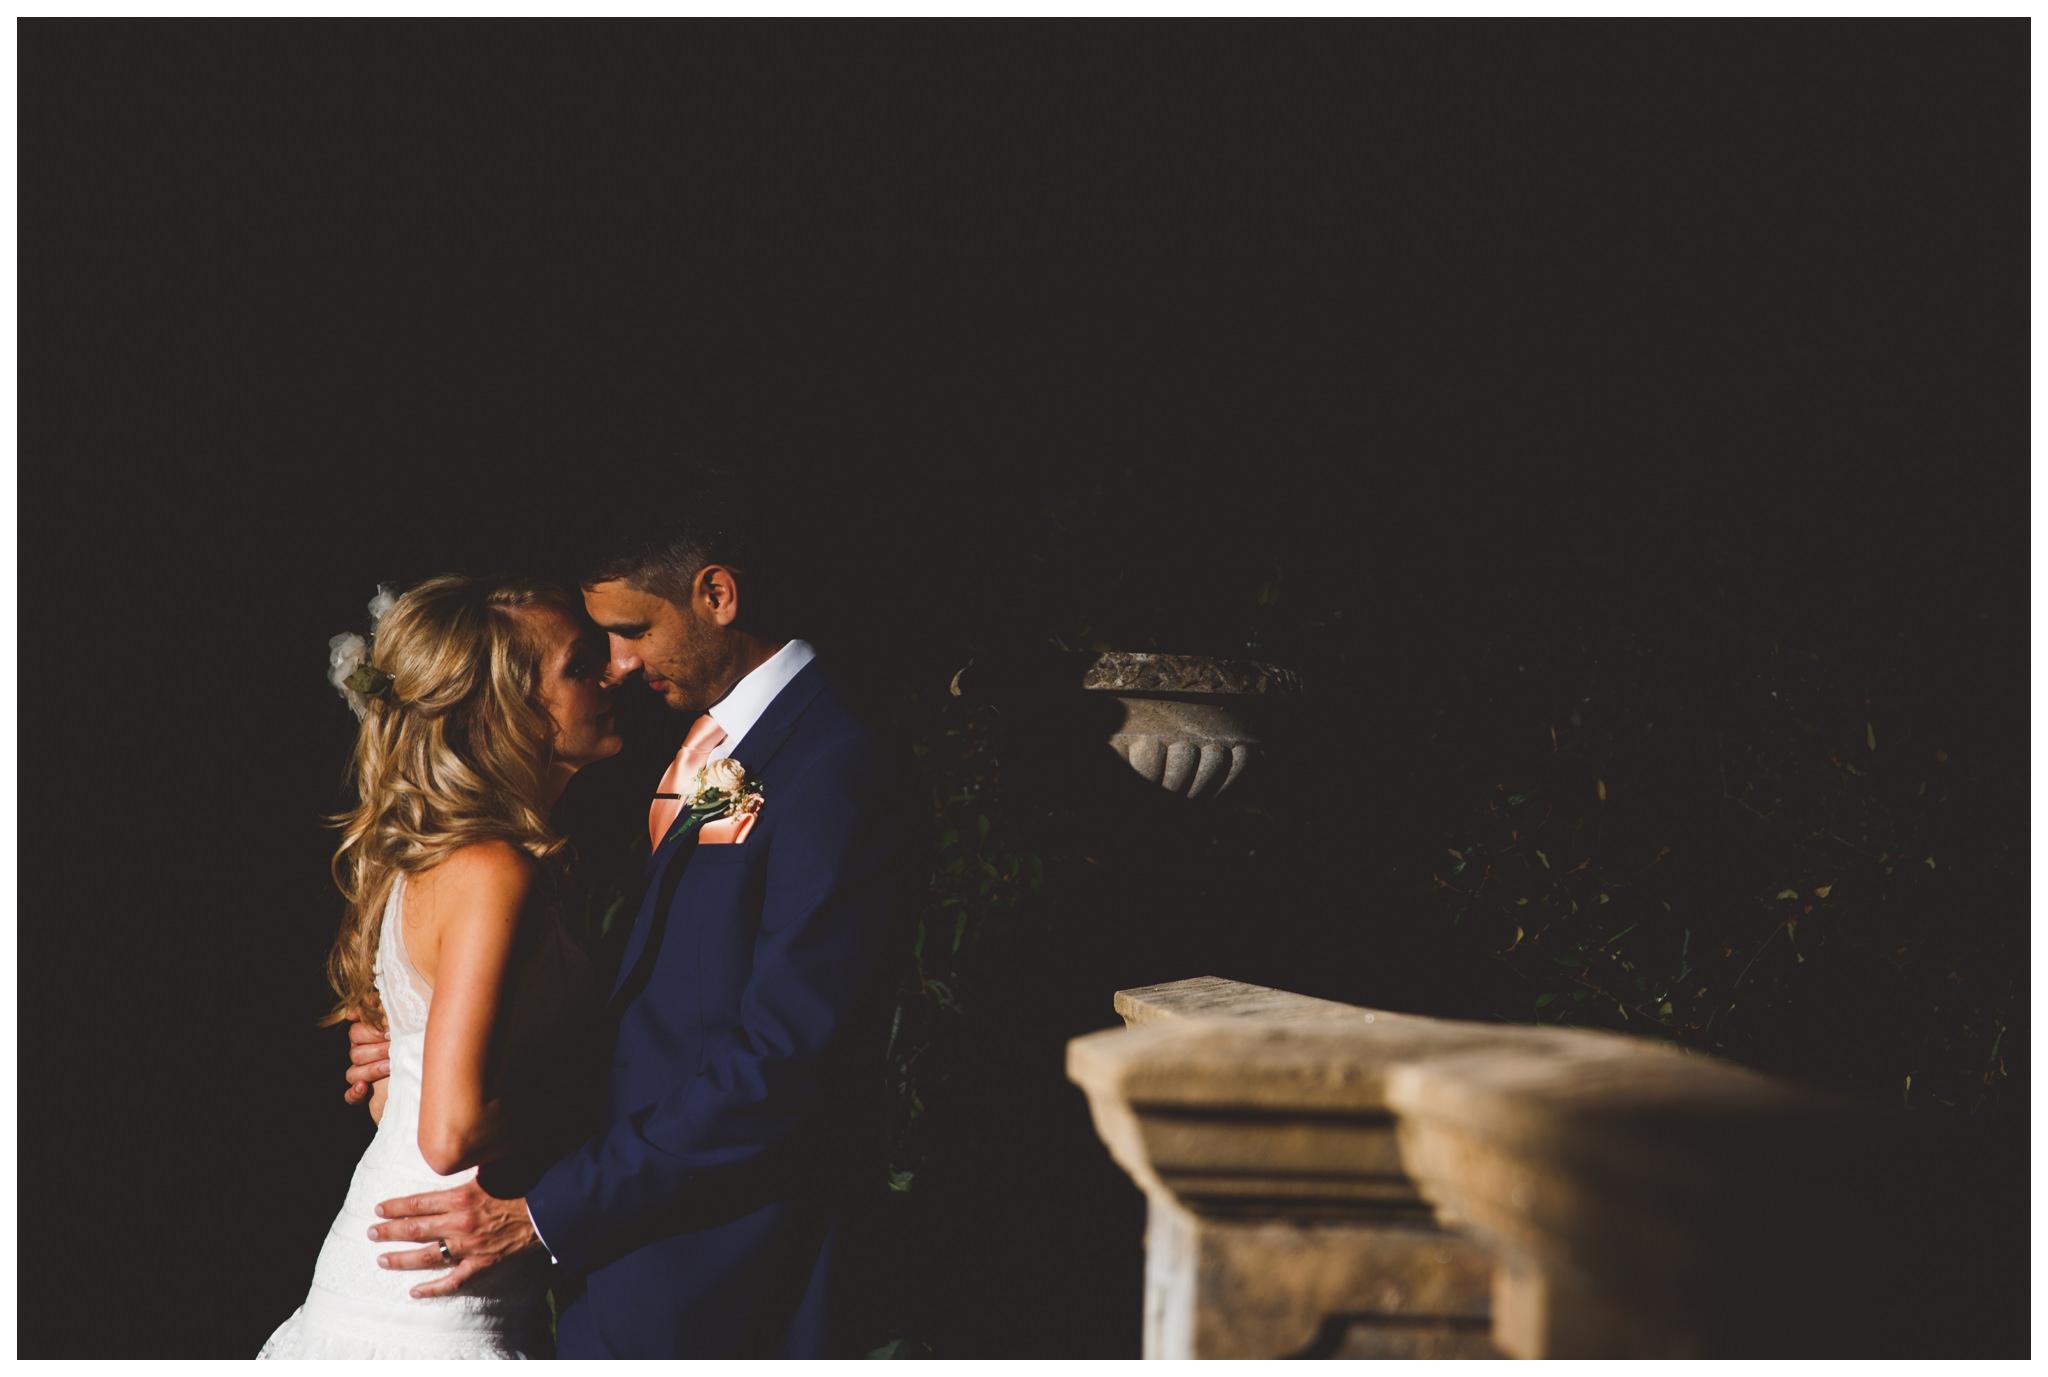 Richard Savage Photography - Wedding - Peterstone Court Brecon - 2016-05-11_0068